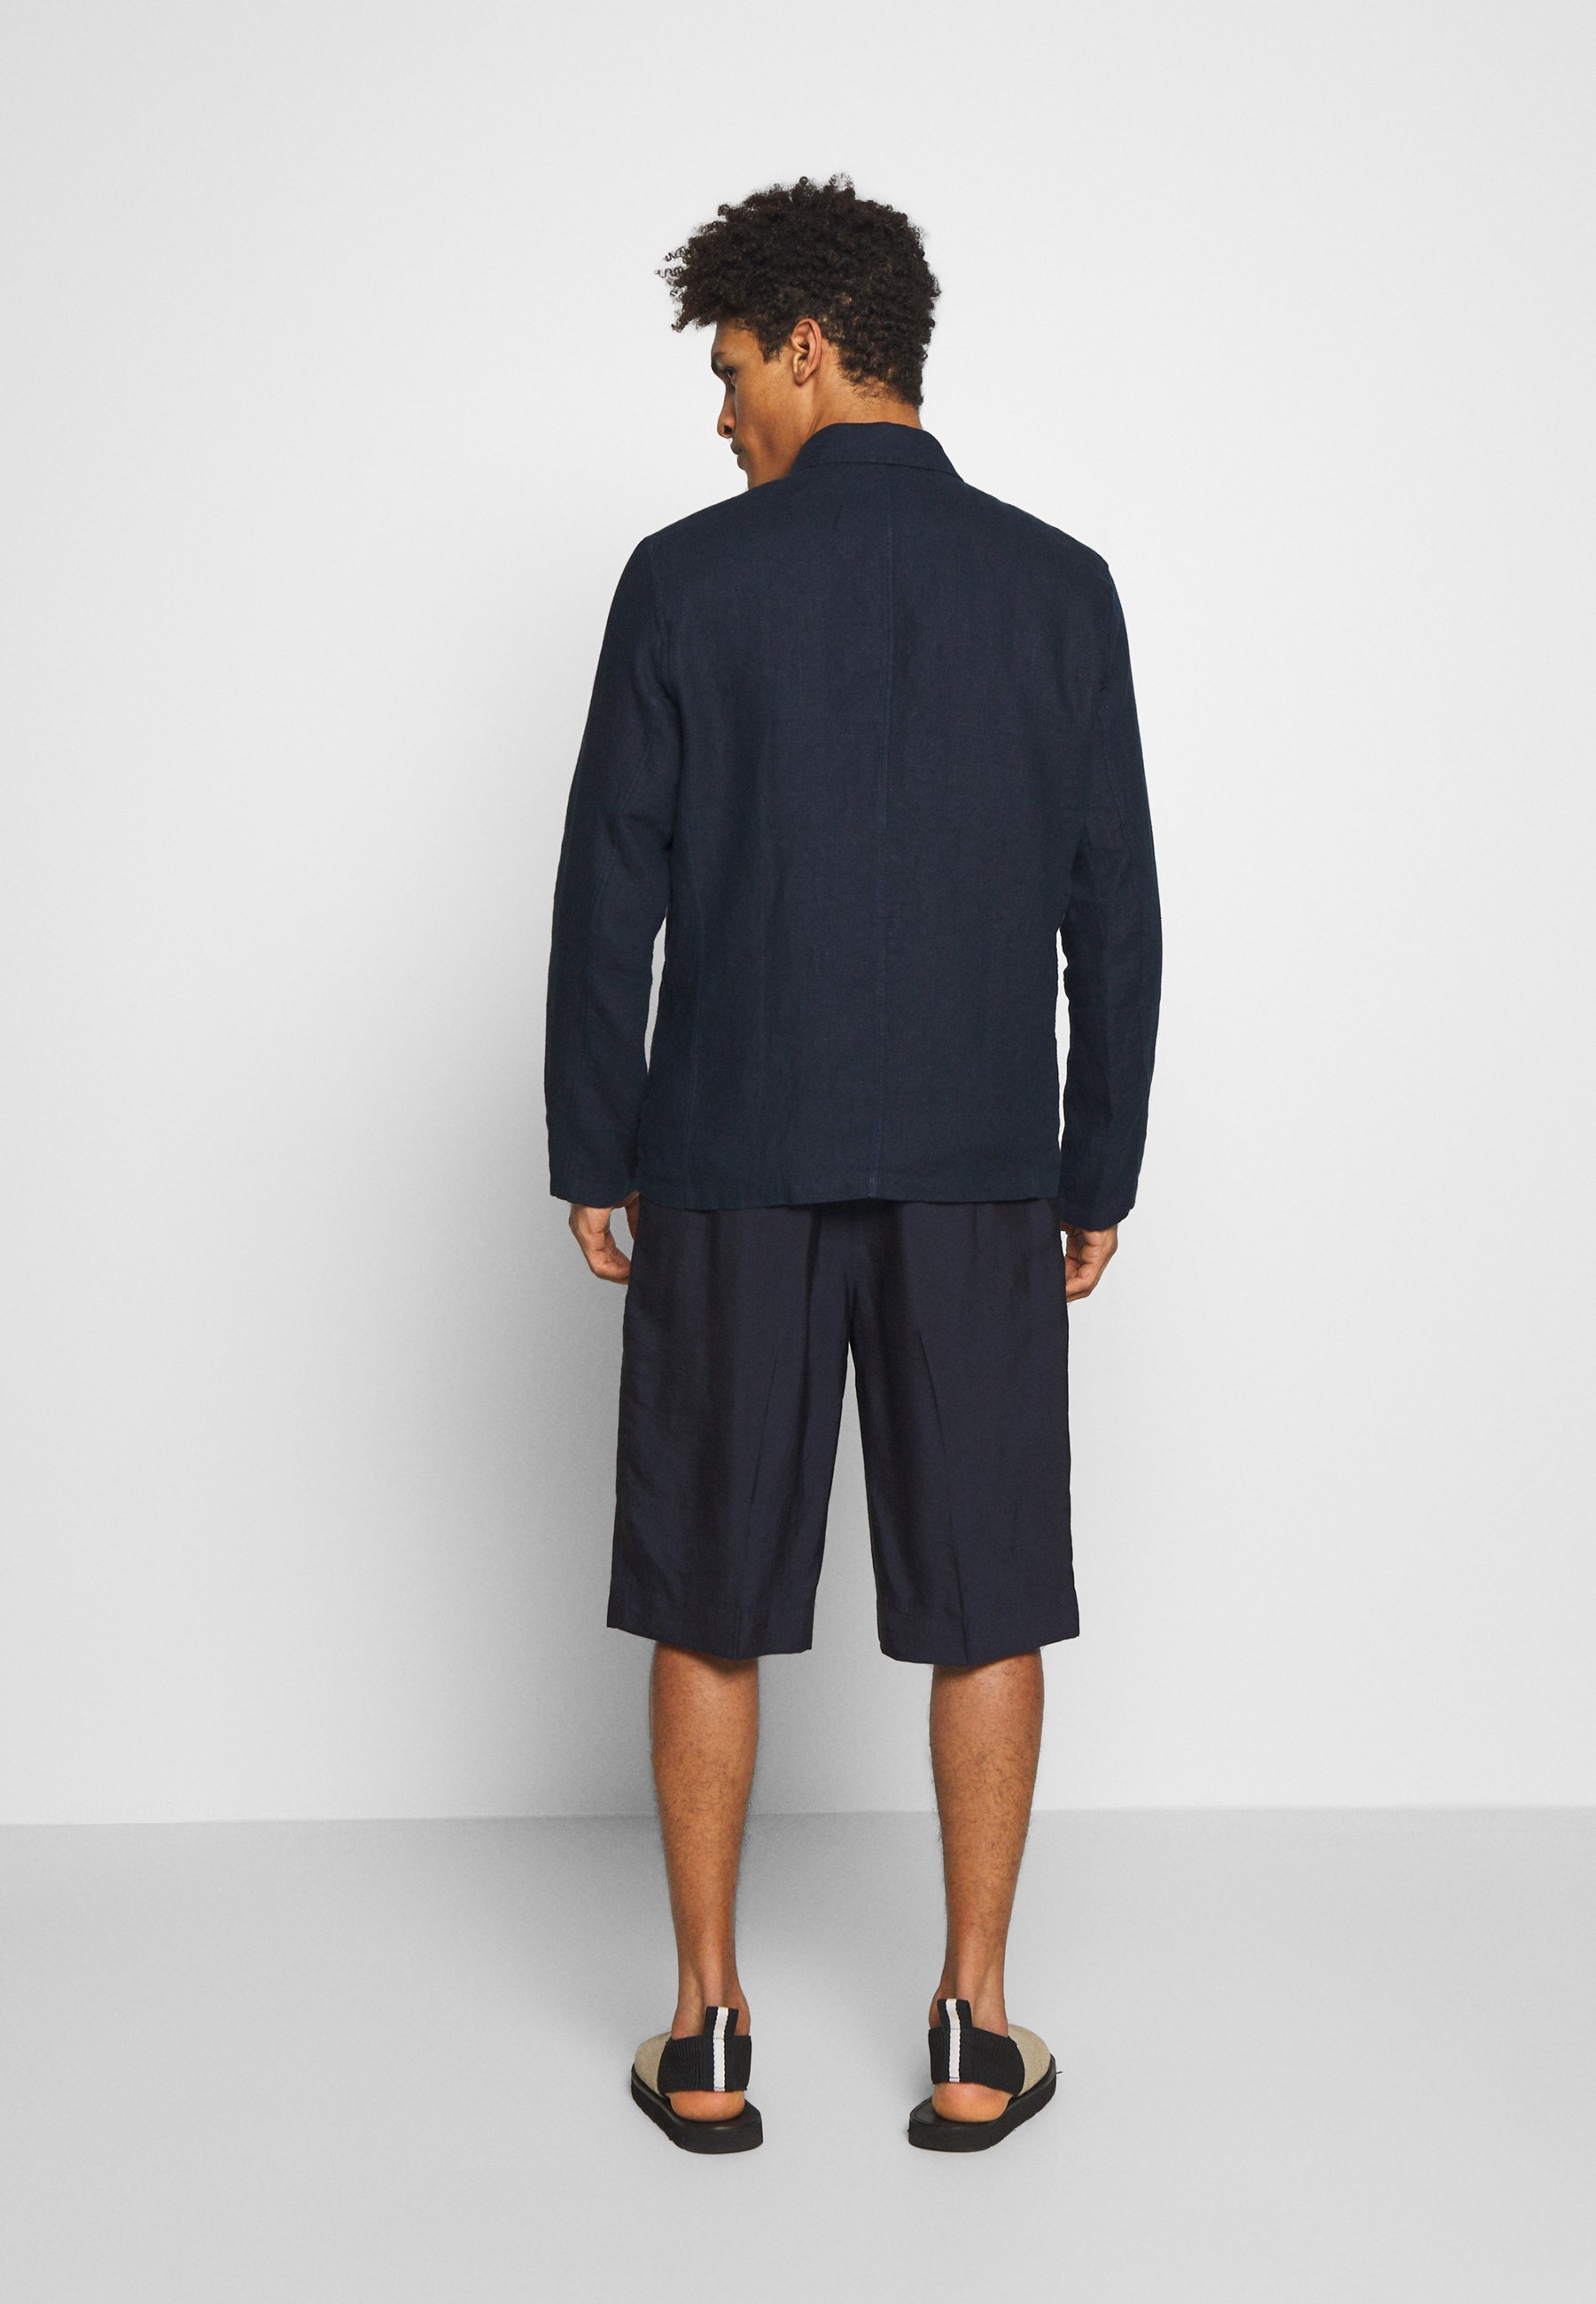 Nn07 Oscar Blazer - Leichte Jacke Navy Blue